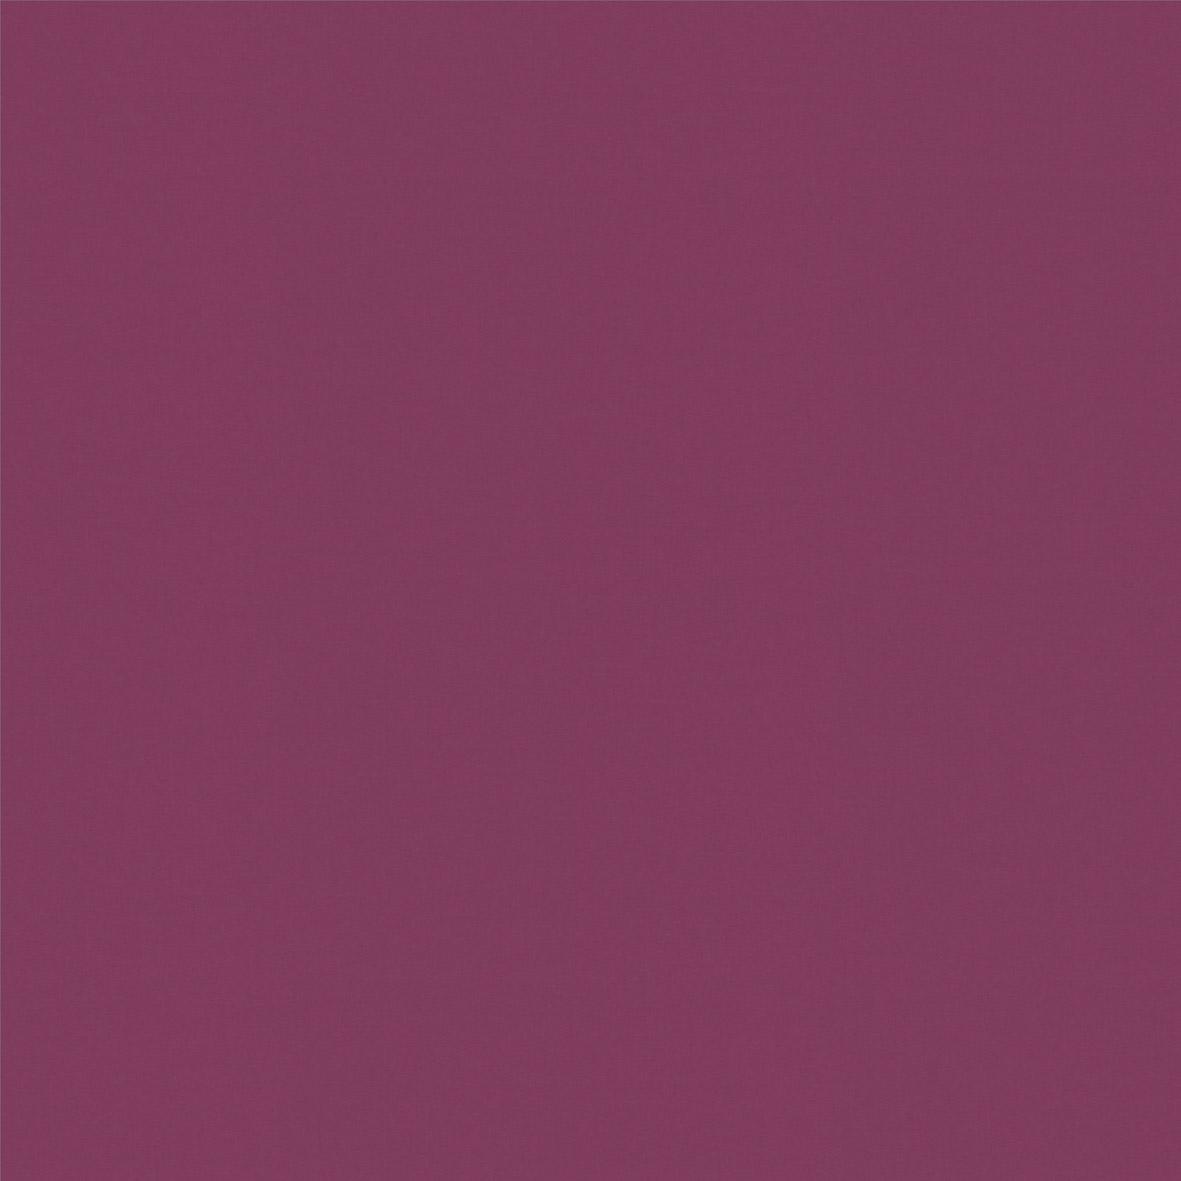 Roller_Swatch_Banlight_Duo_FR_Grape_RE0317